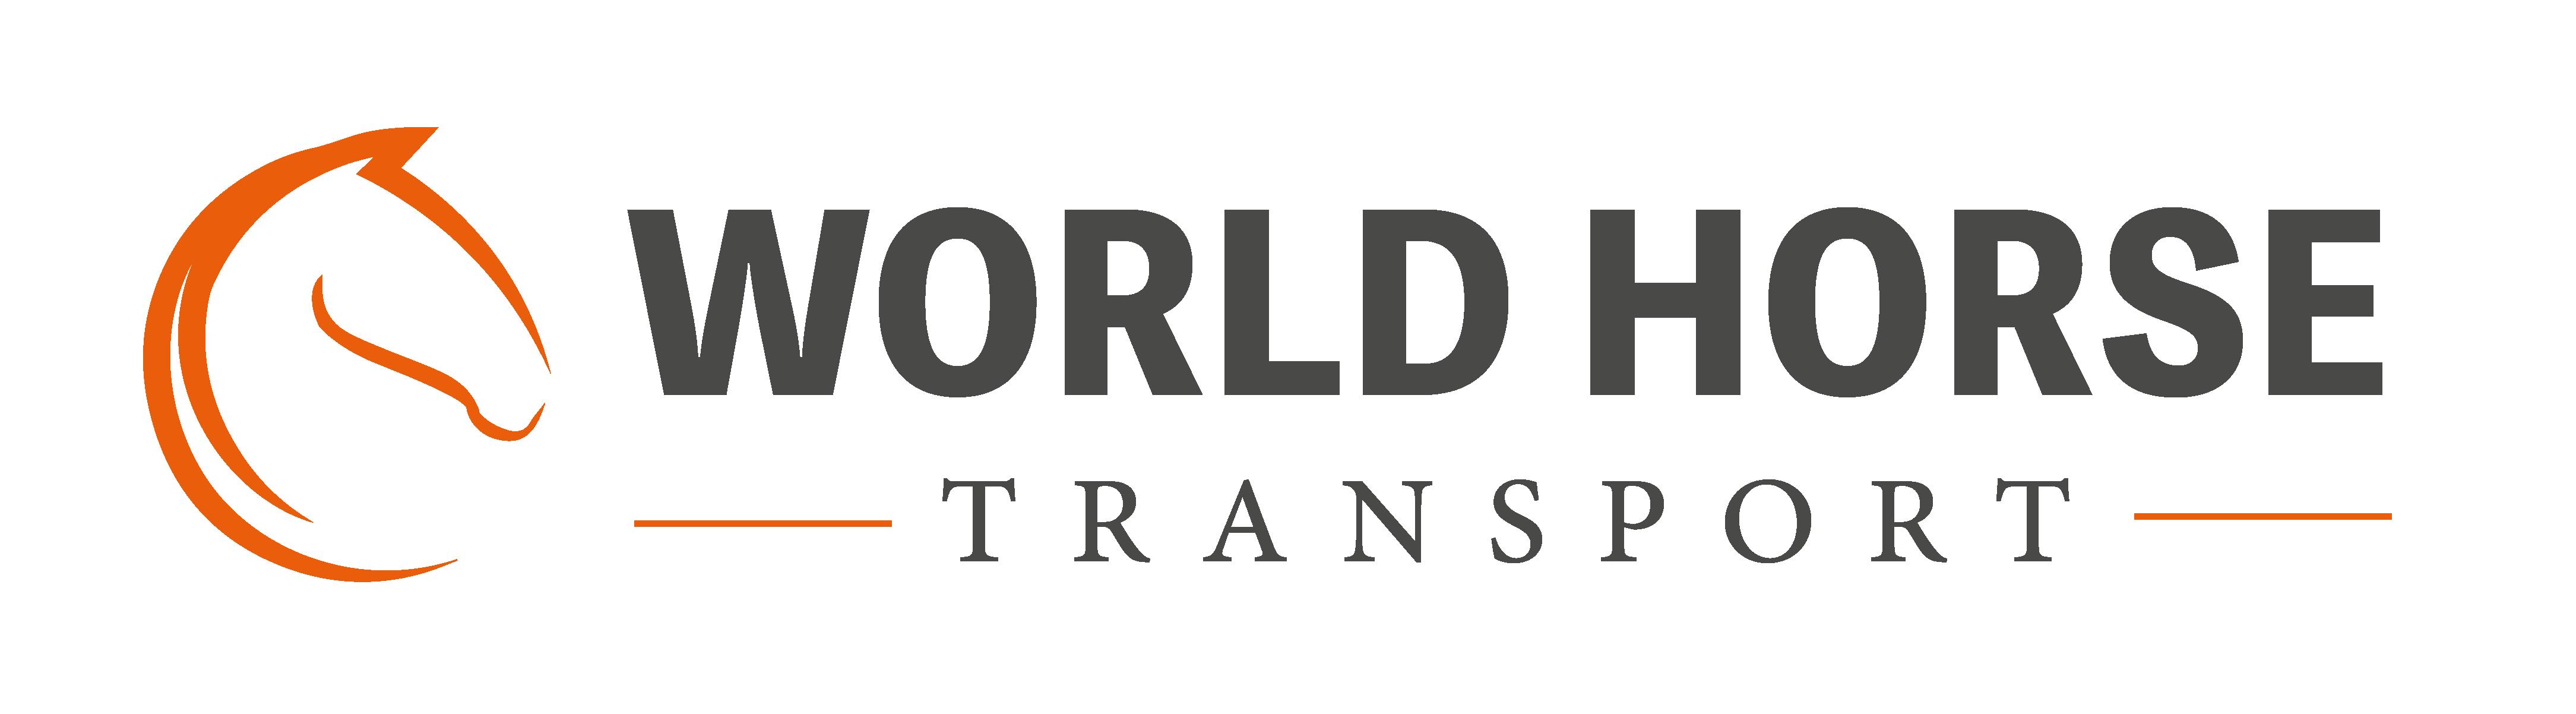 World Horse Transport BV